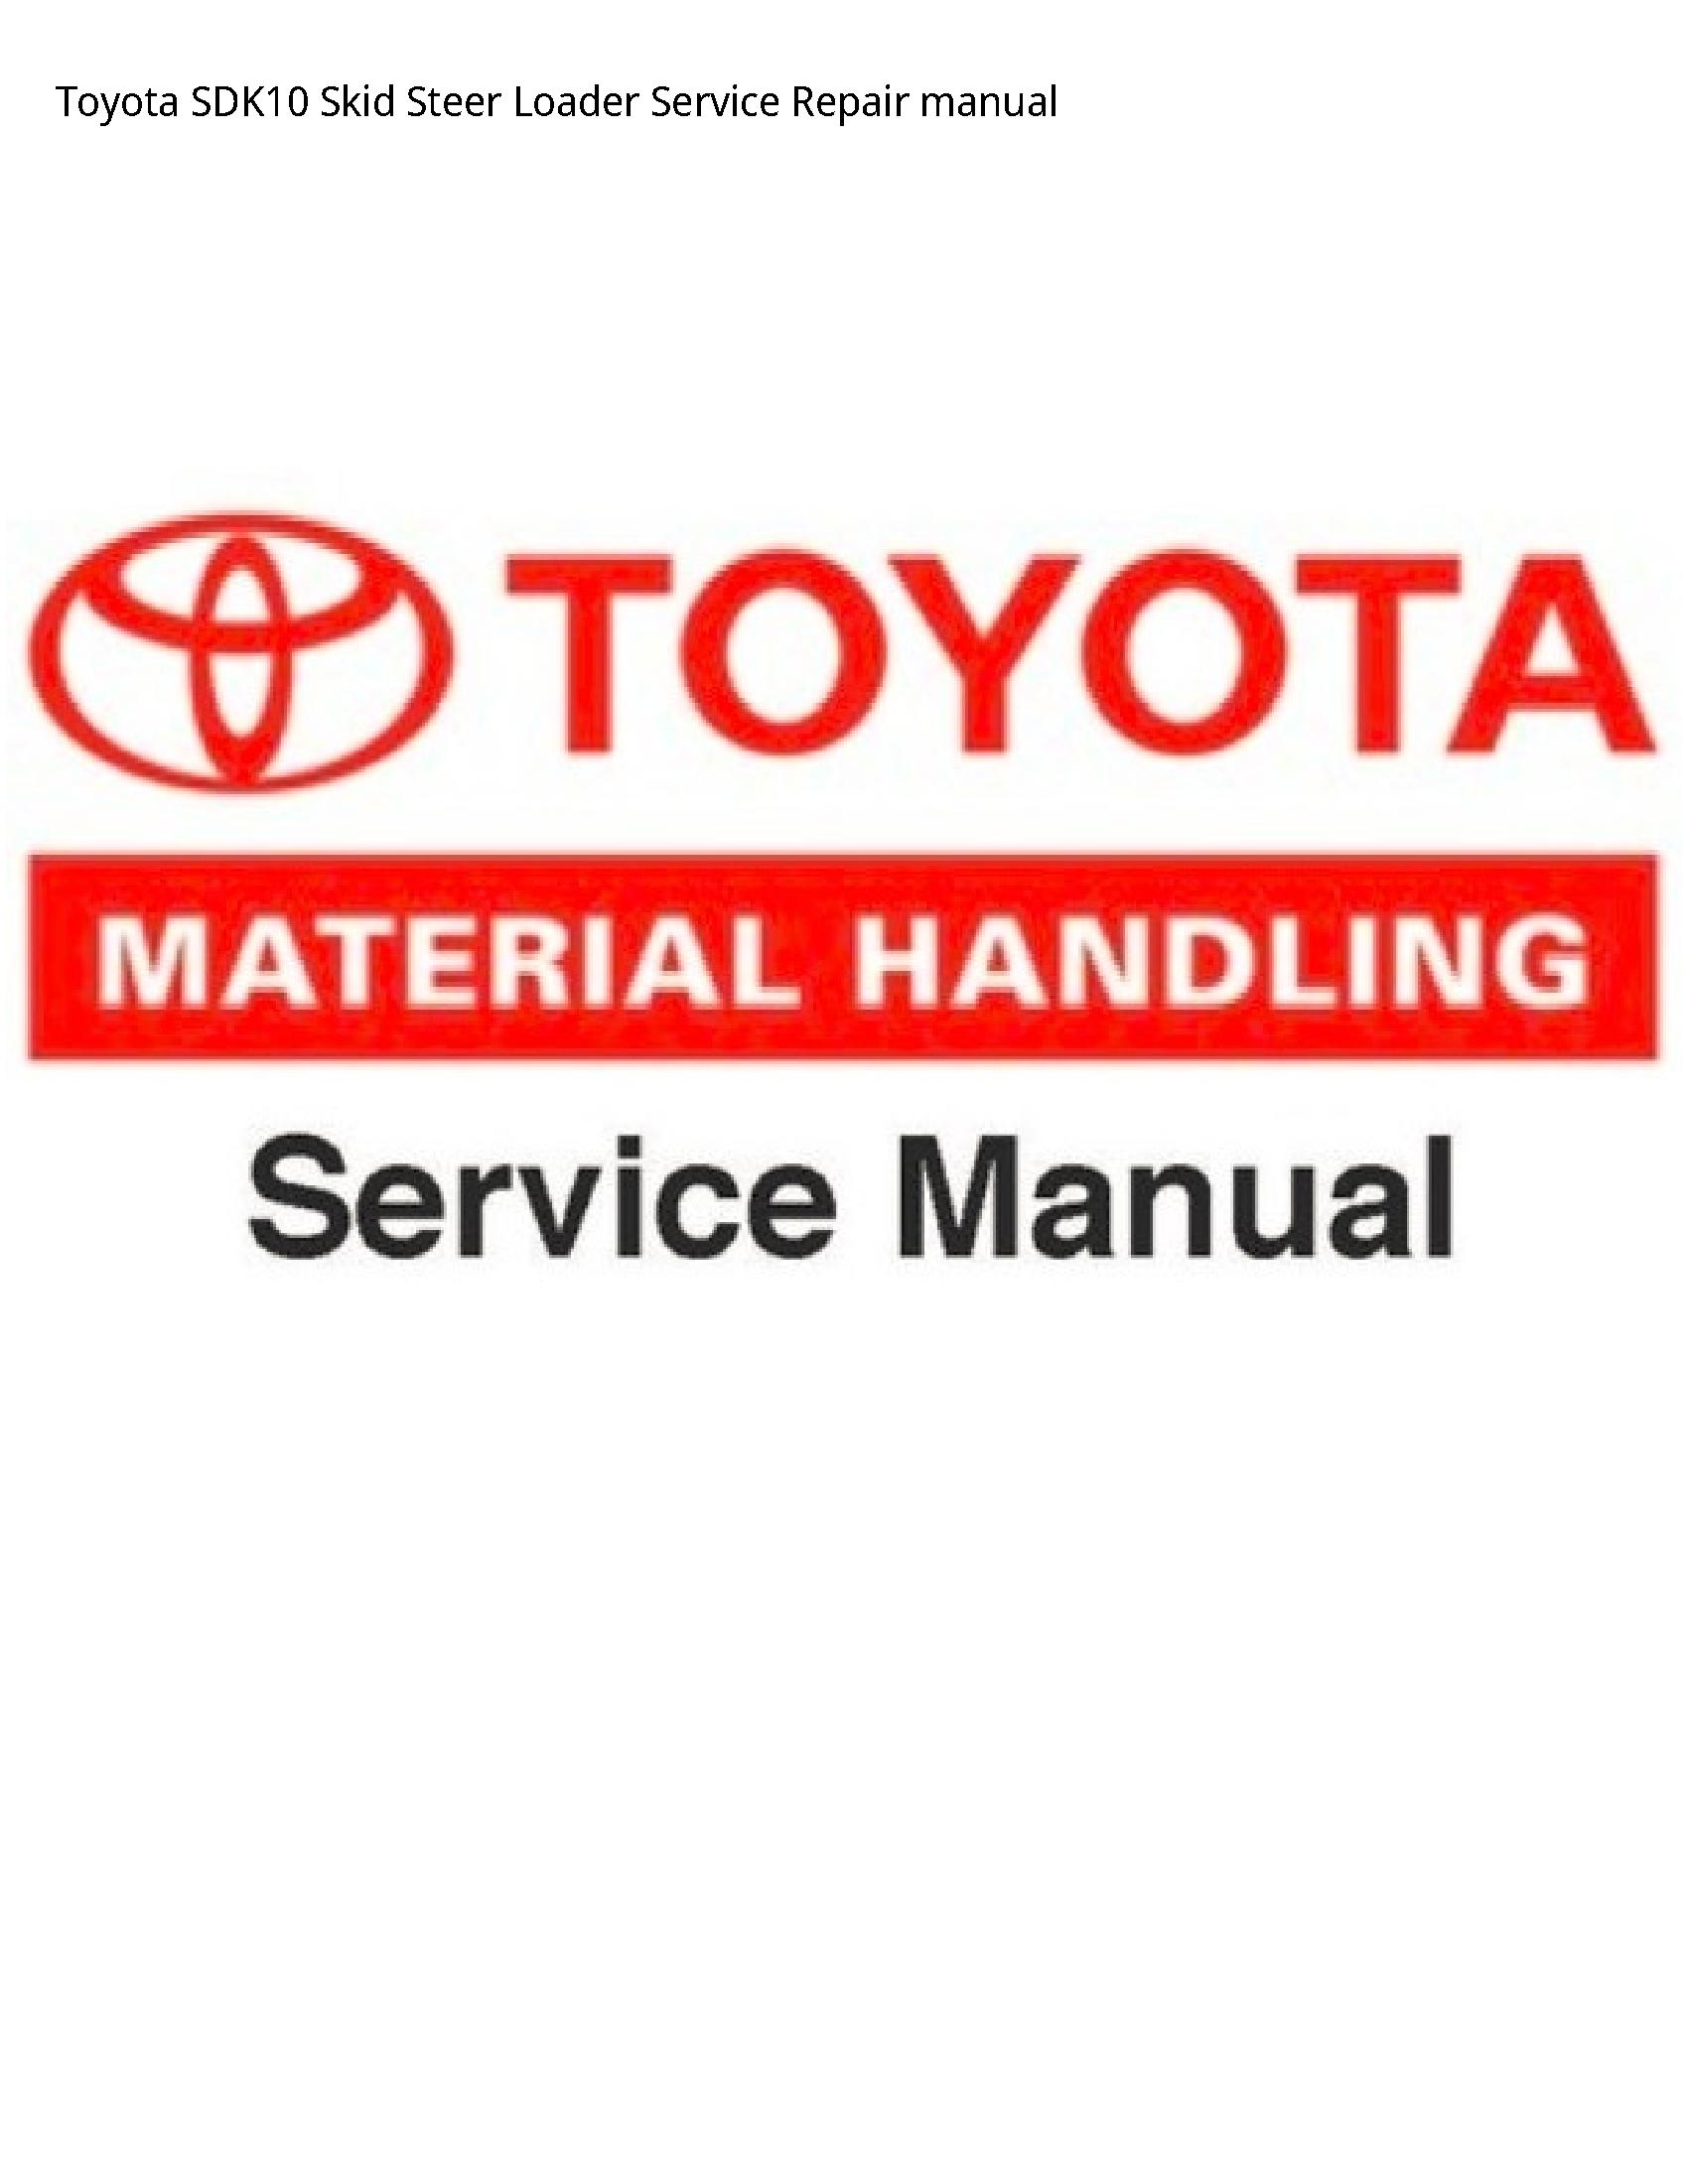 Toyota SDK10 Skid Steer Loader manual